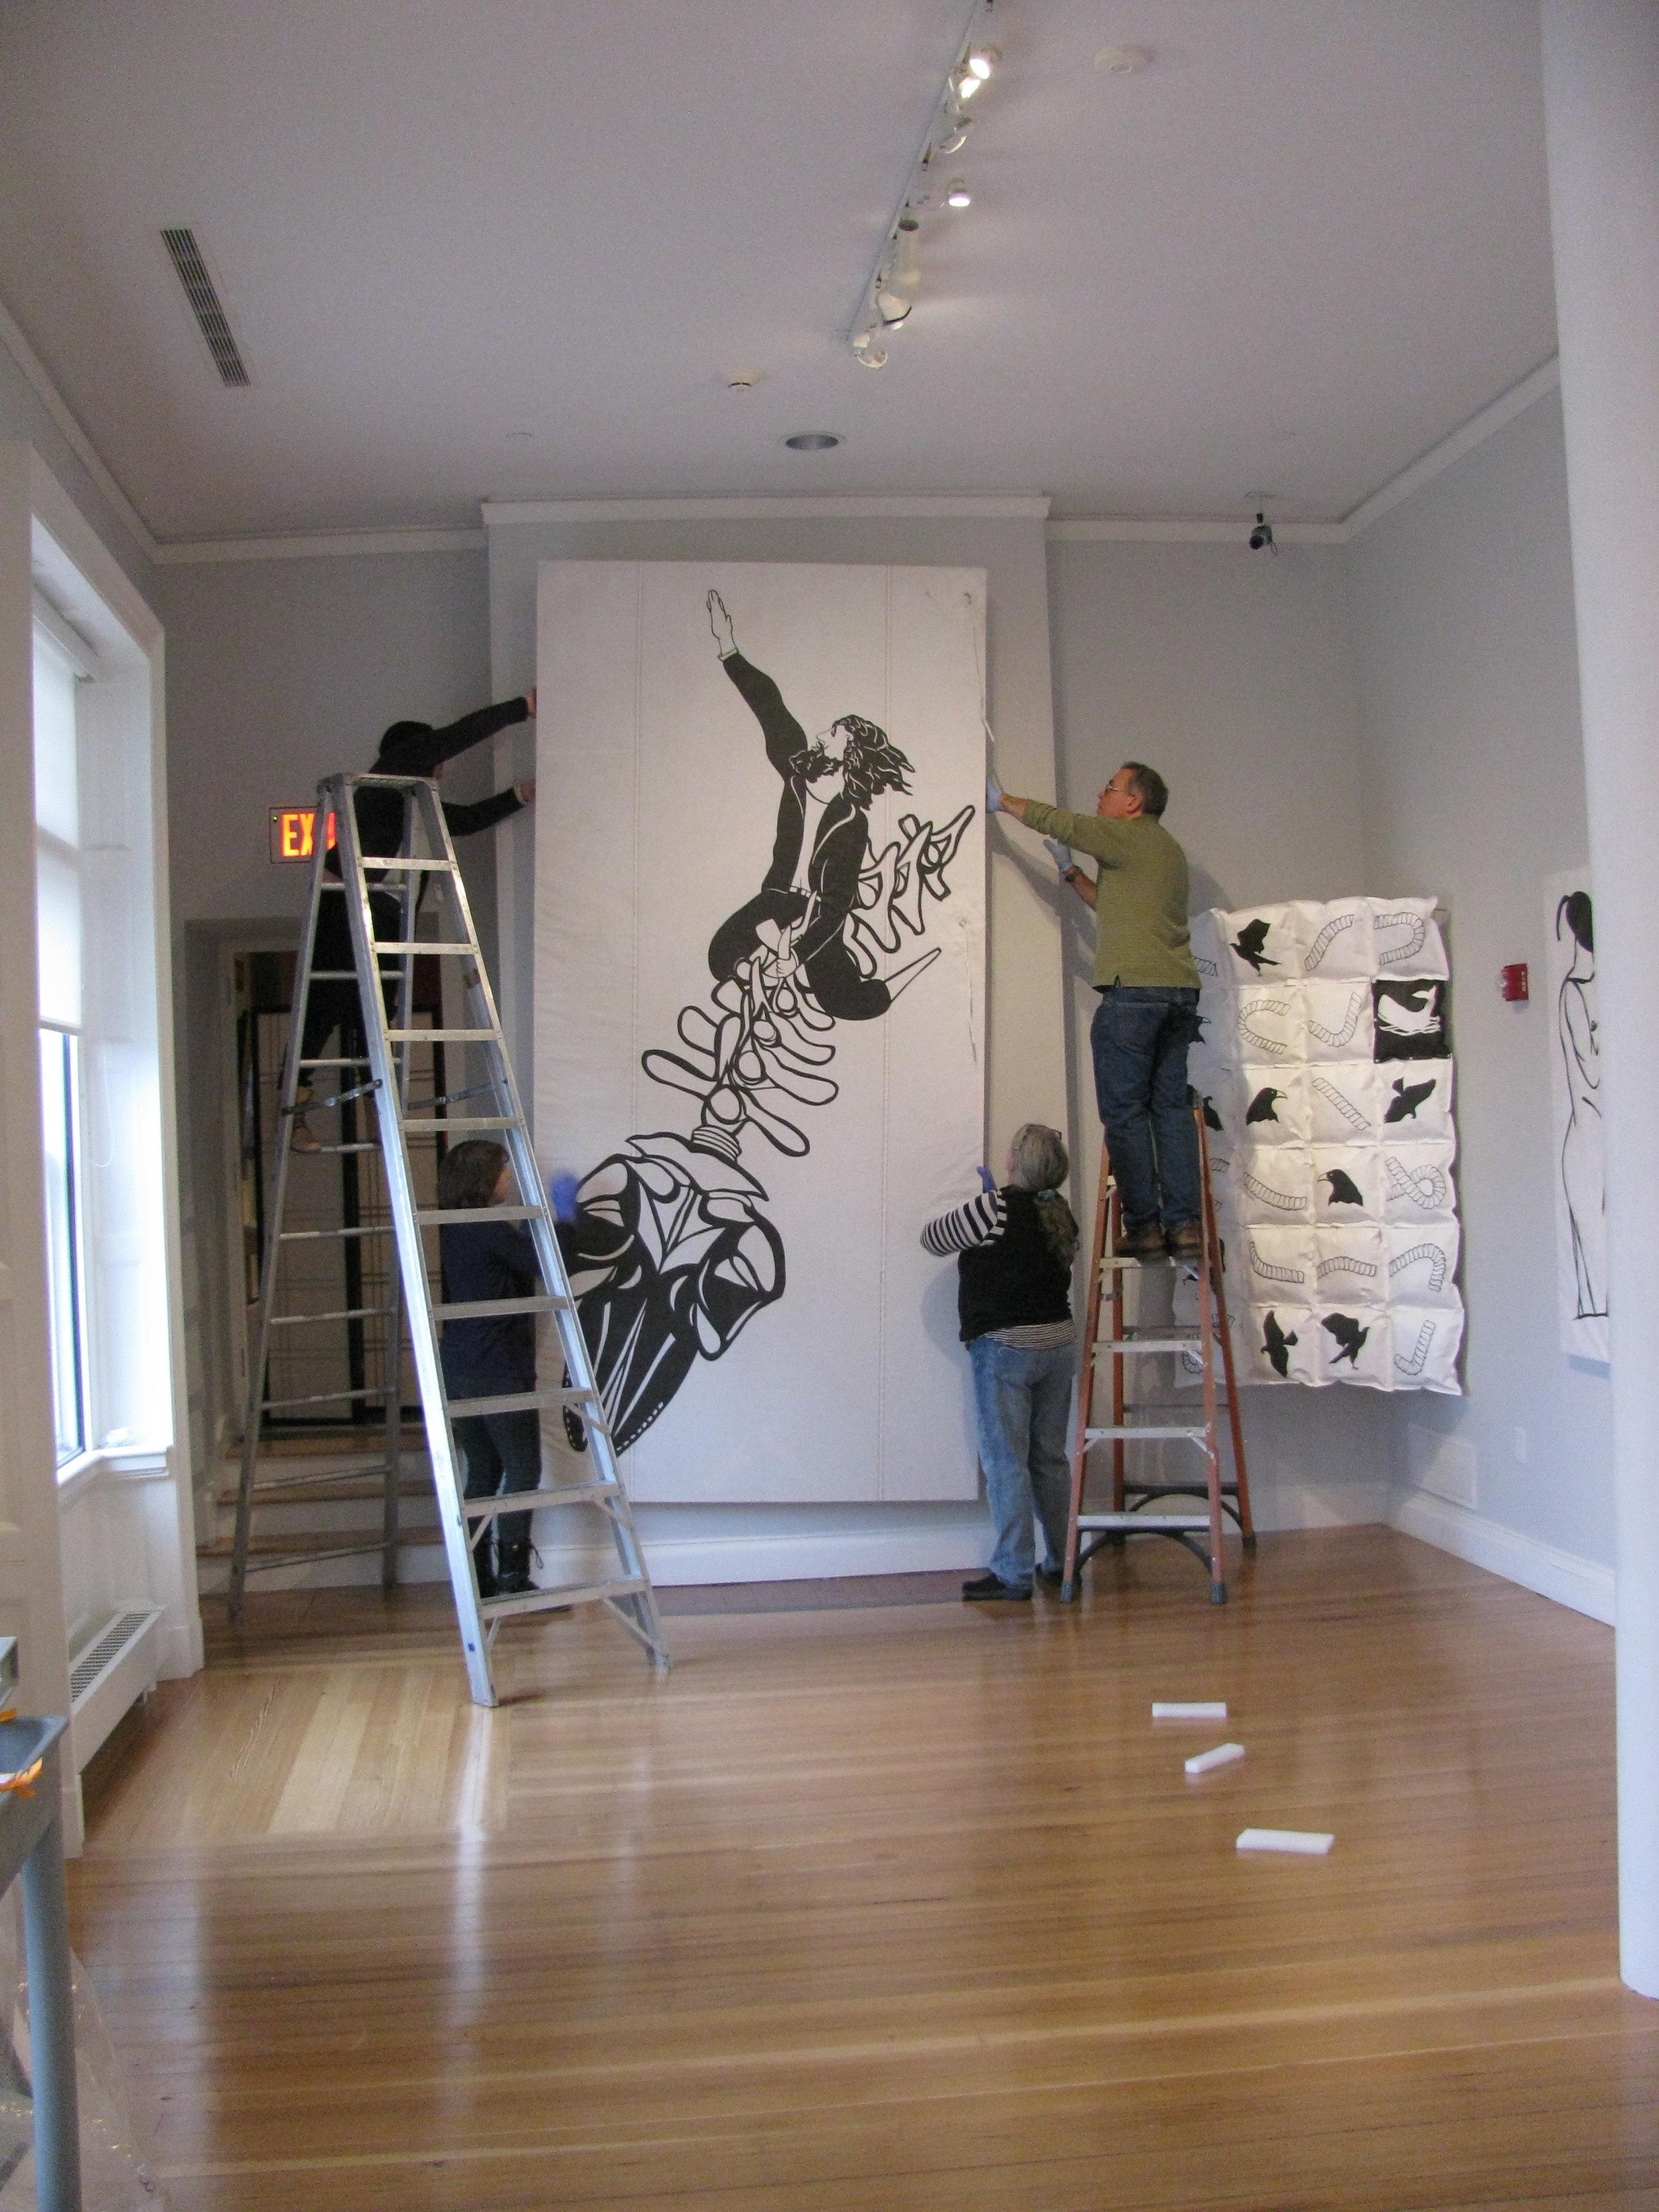 Peter Martin Moby Dick 1.jpg